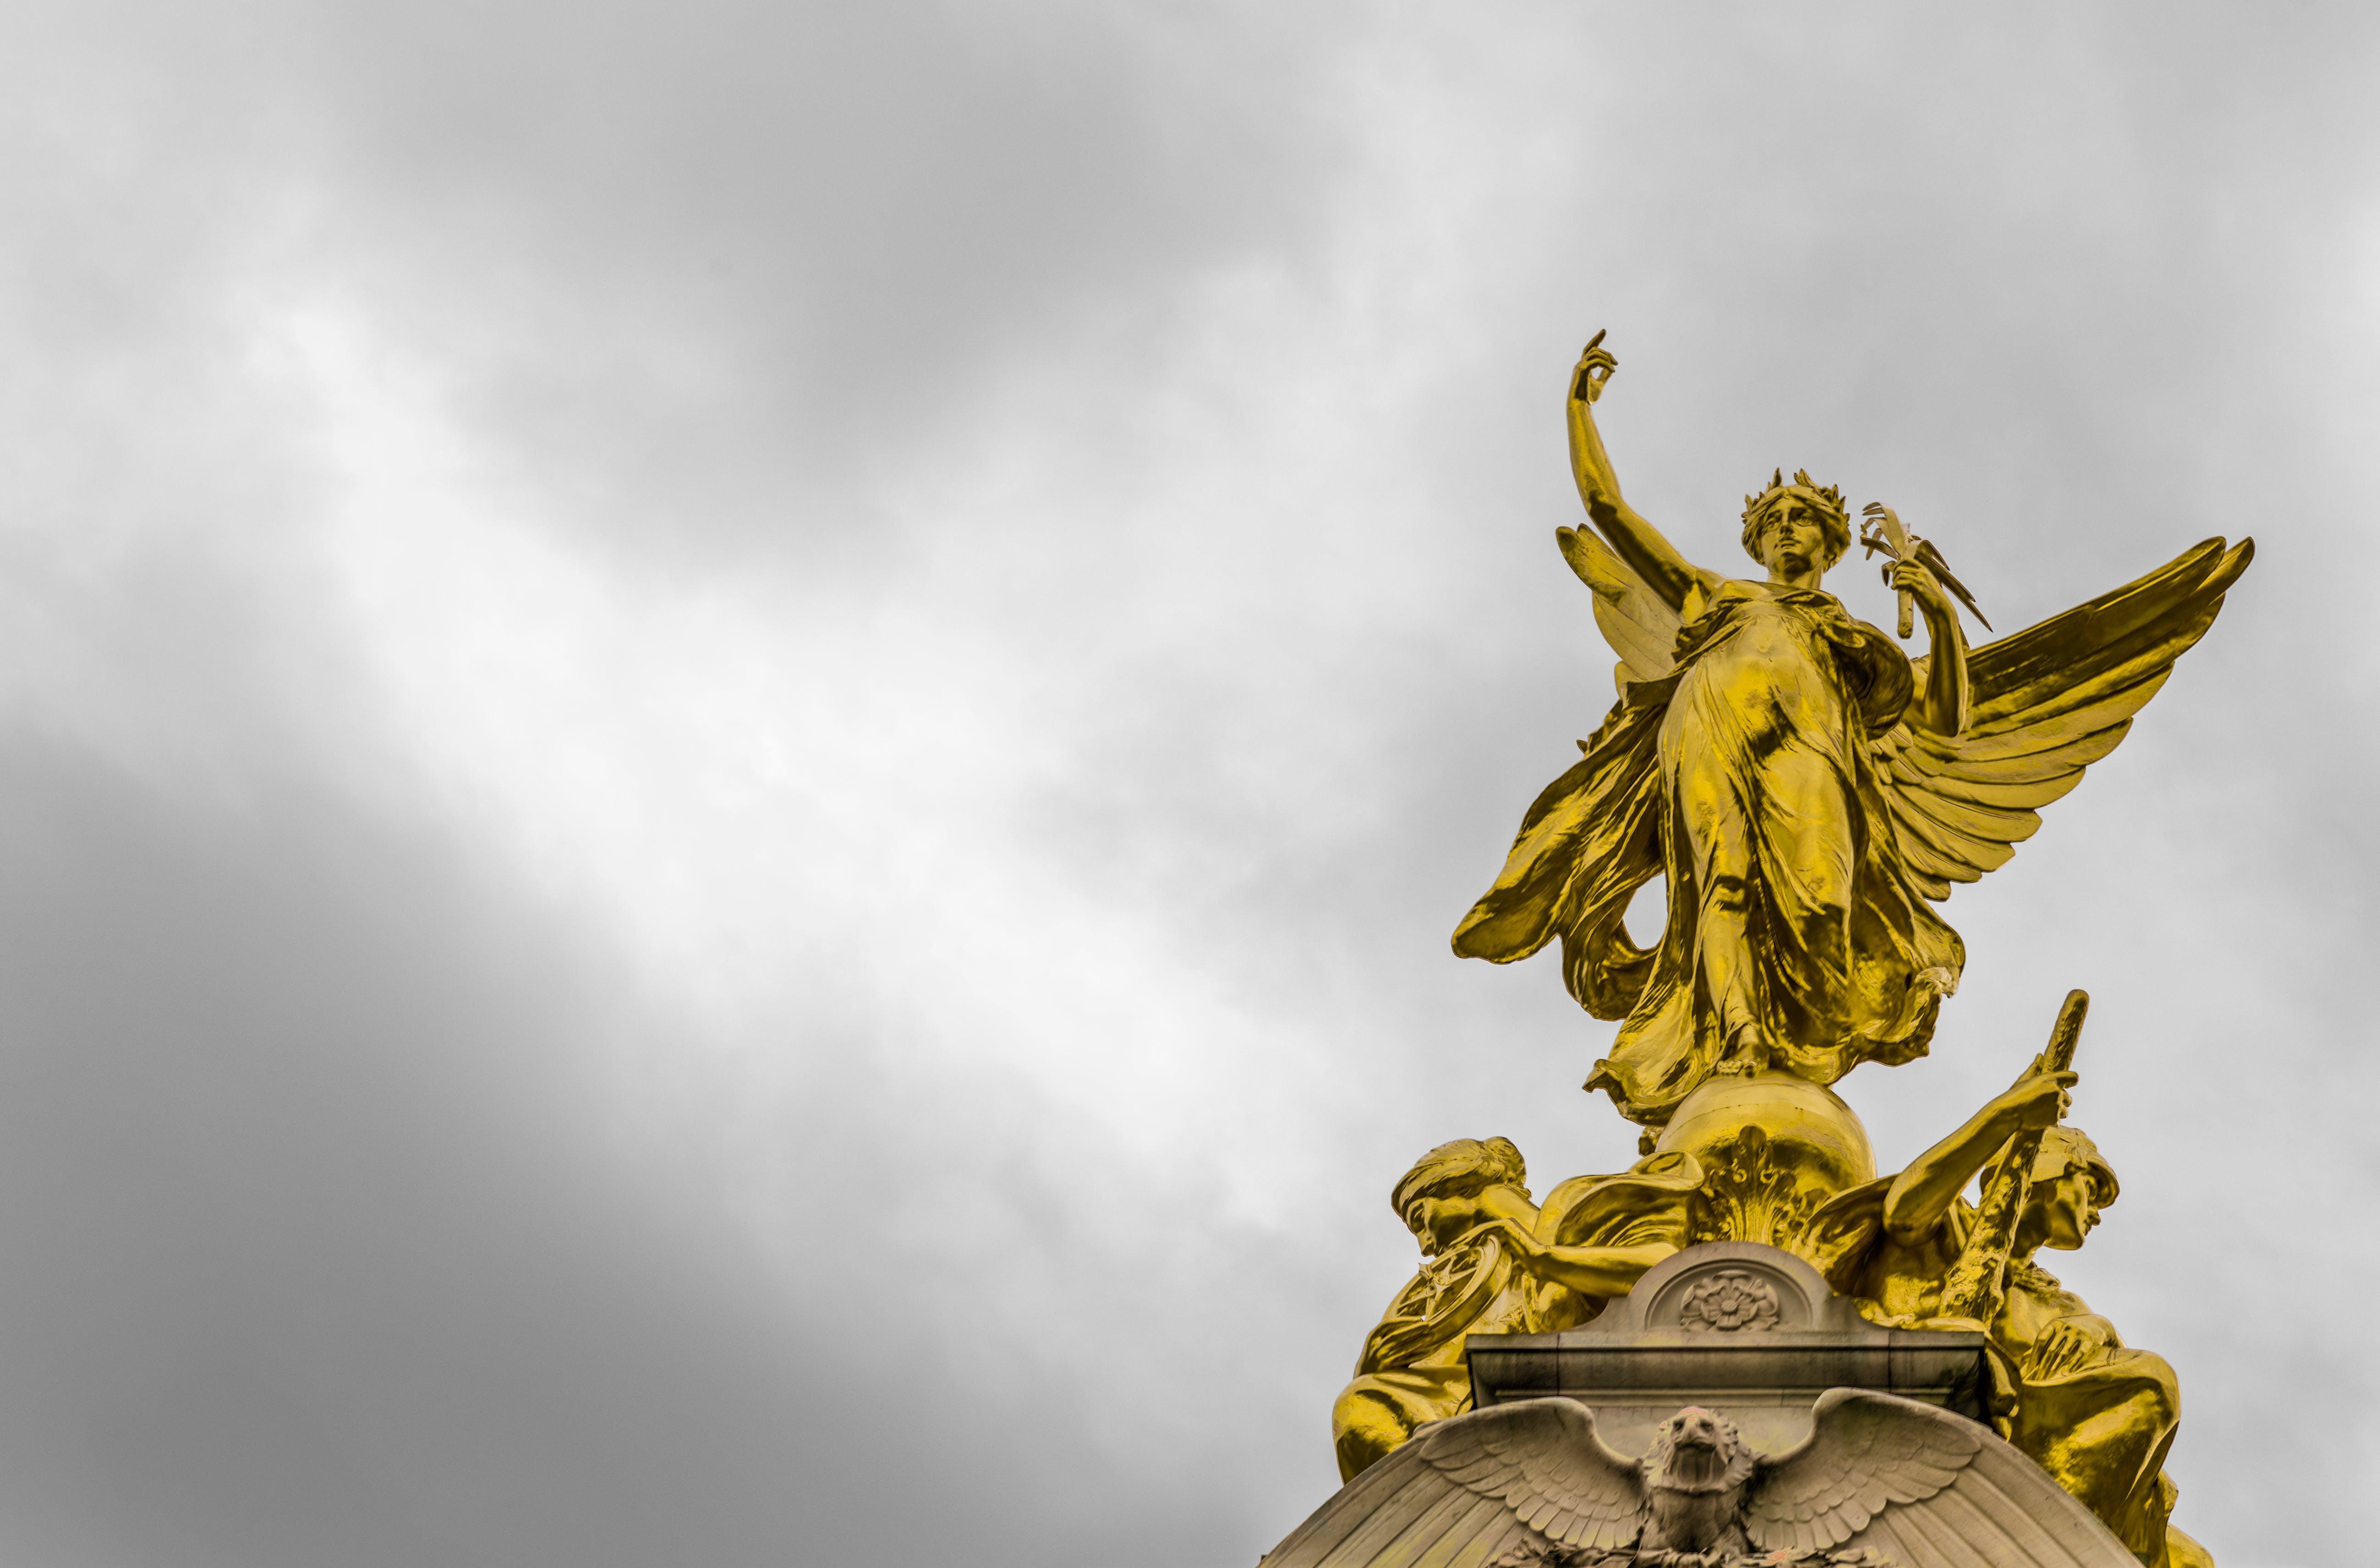 Gold Angel Statue Under Grey Clouds